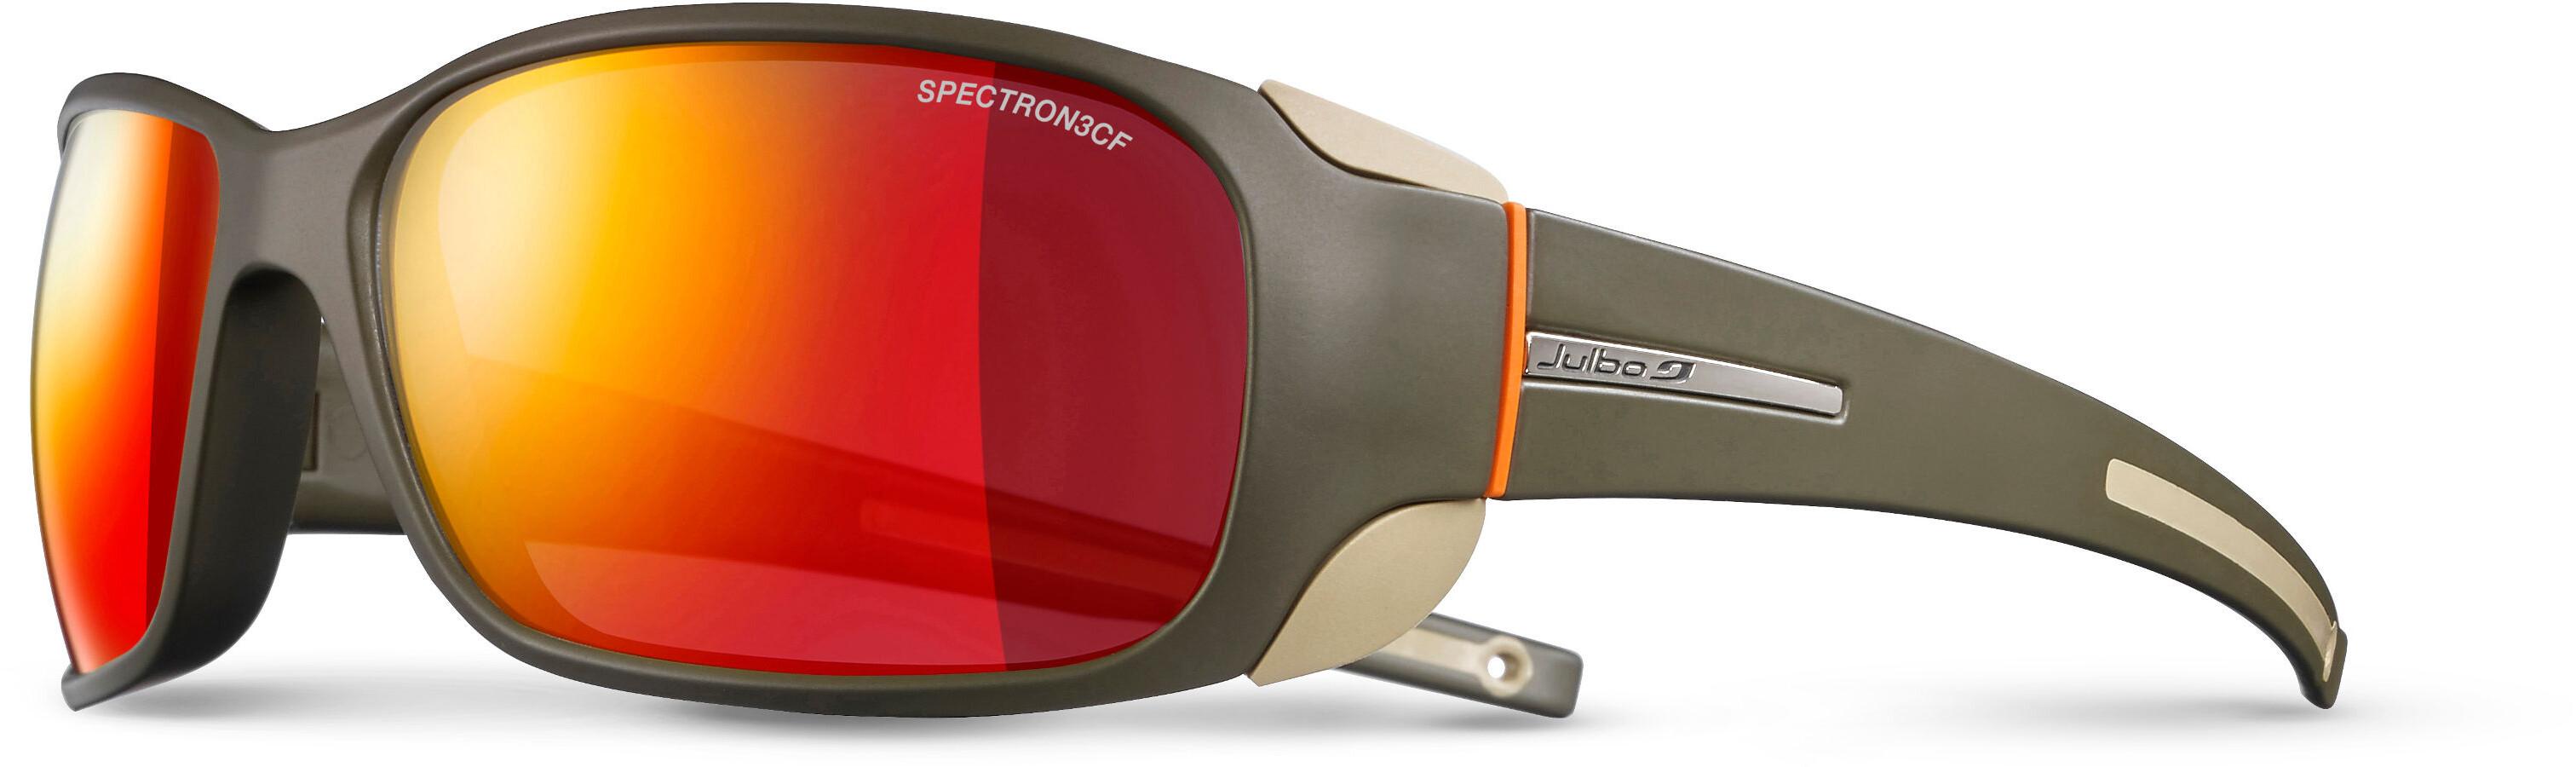 e0745a7969 Julbo Montebianco Spectron 3CF Glasses orange olive at Addnature.co.uk